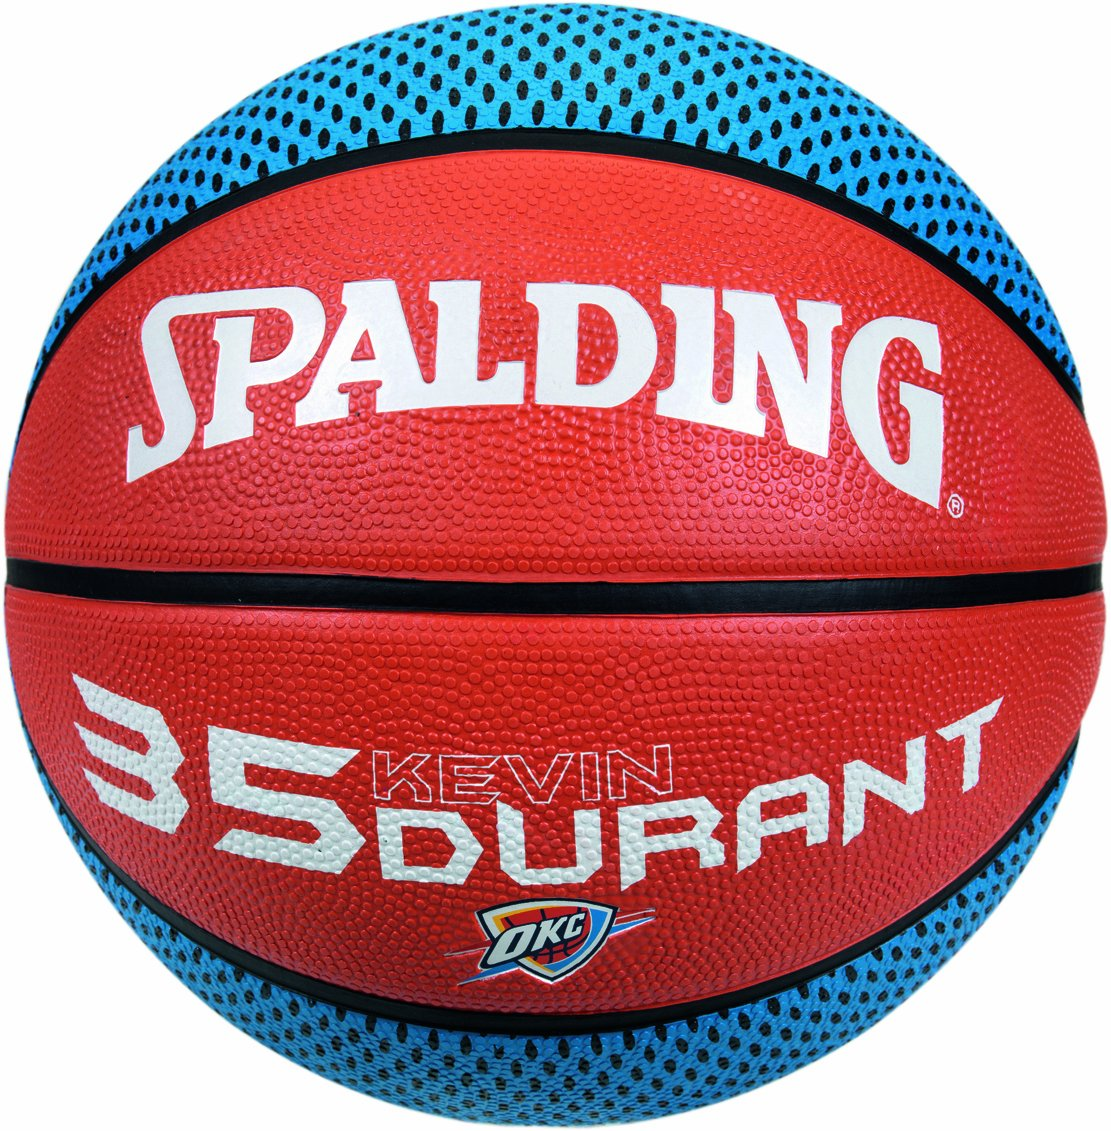 Spalding Ball Player Kevin Durant 73-817z - Pelota de Baloncesto ...